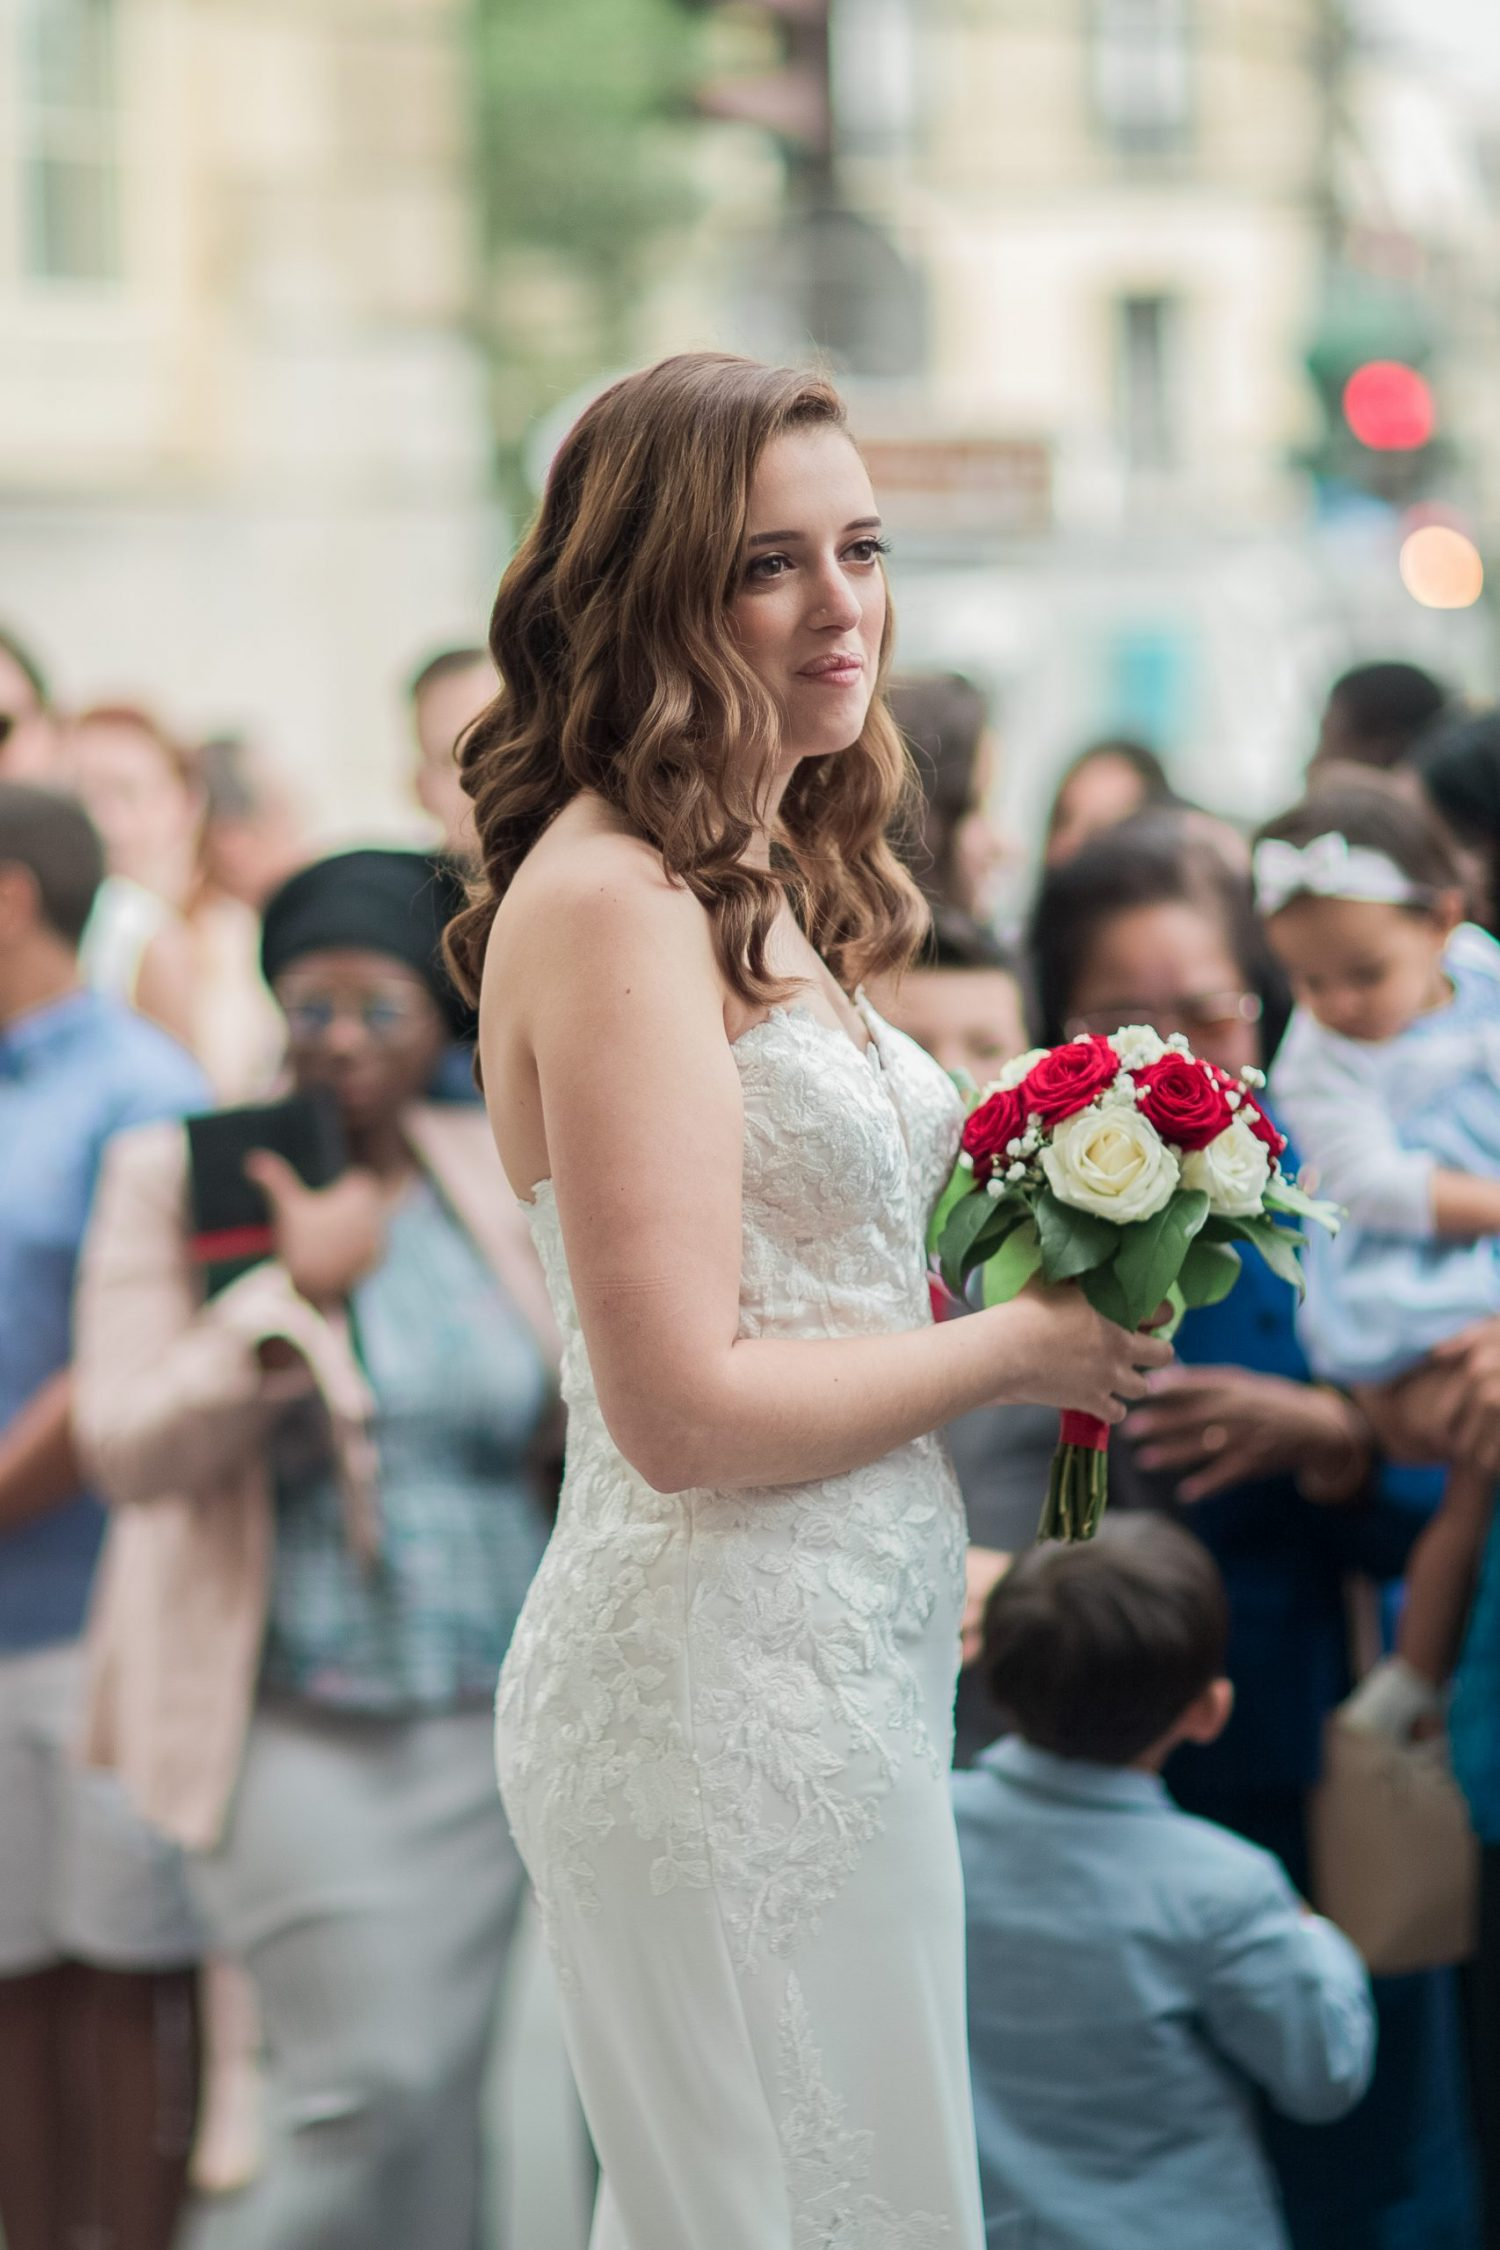 photographe mariage paris mairie du 18eme